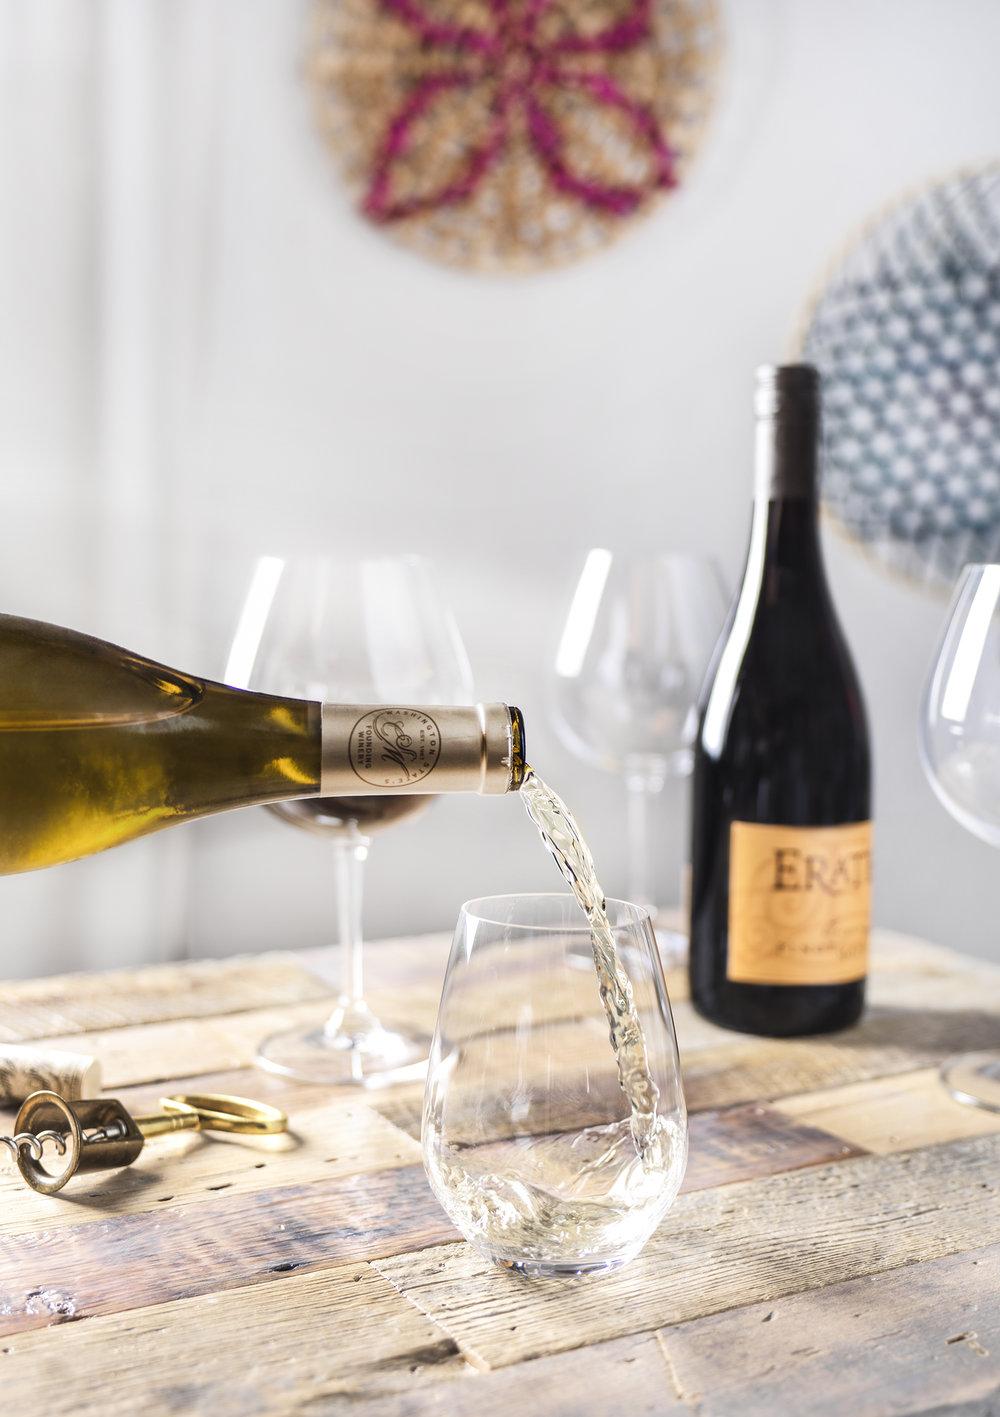 17033 - Publix Wine_0840combined.jpg